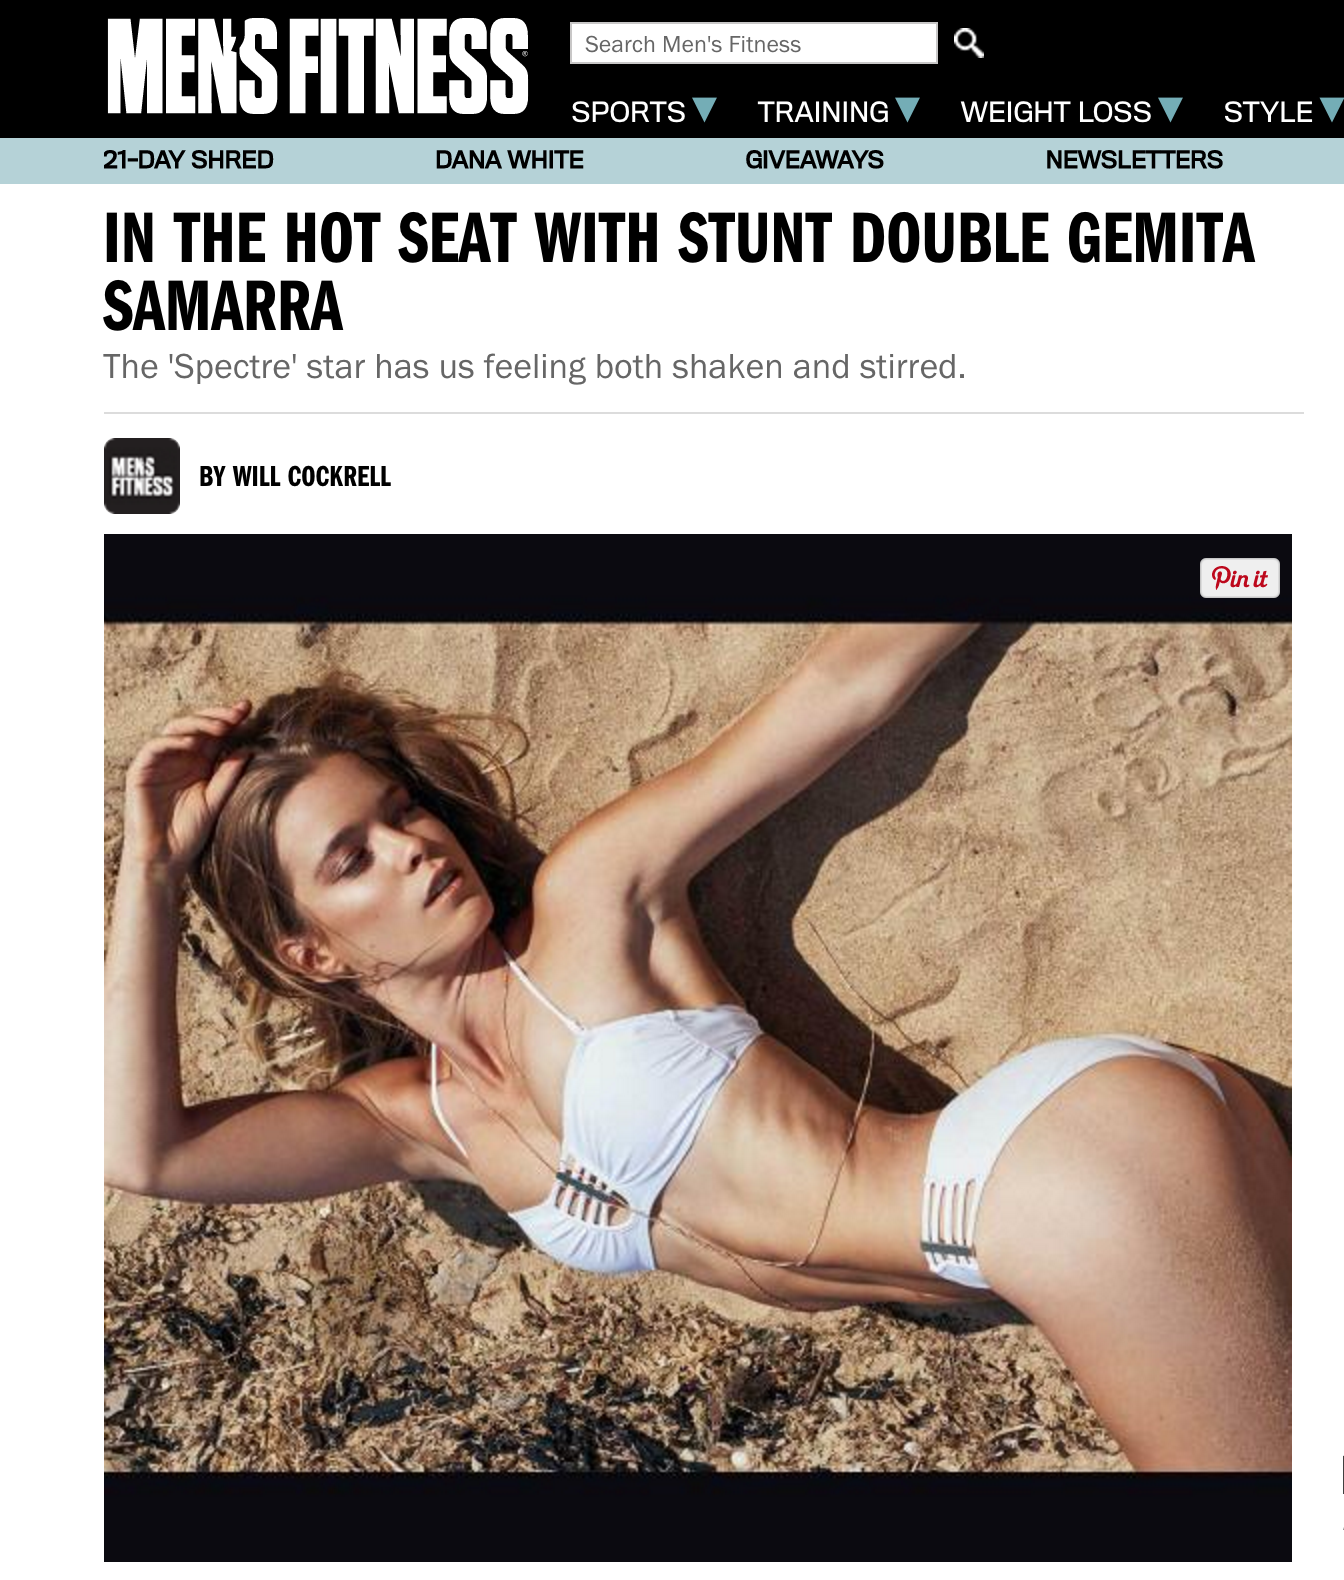 Mens Fitness- In the hot seat with Gemita    http://www.mensfitness.com/life/entertainment/hot-seat-stunt-double-gemita-samarra